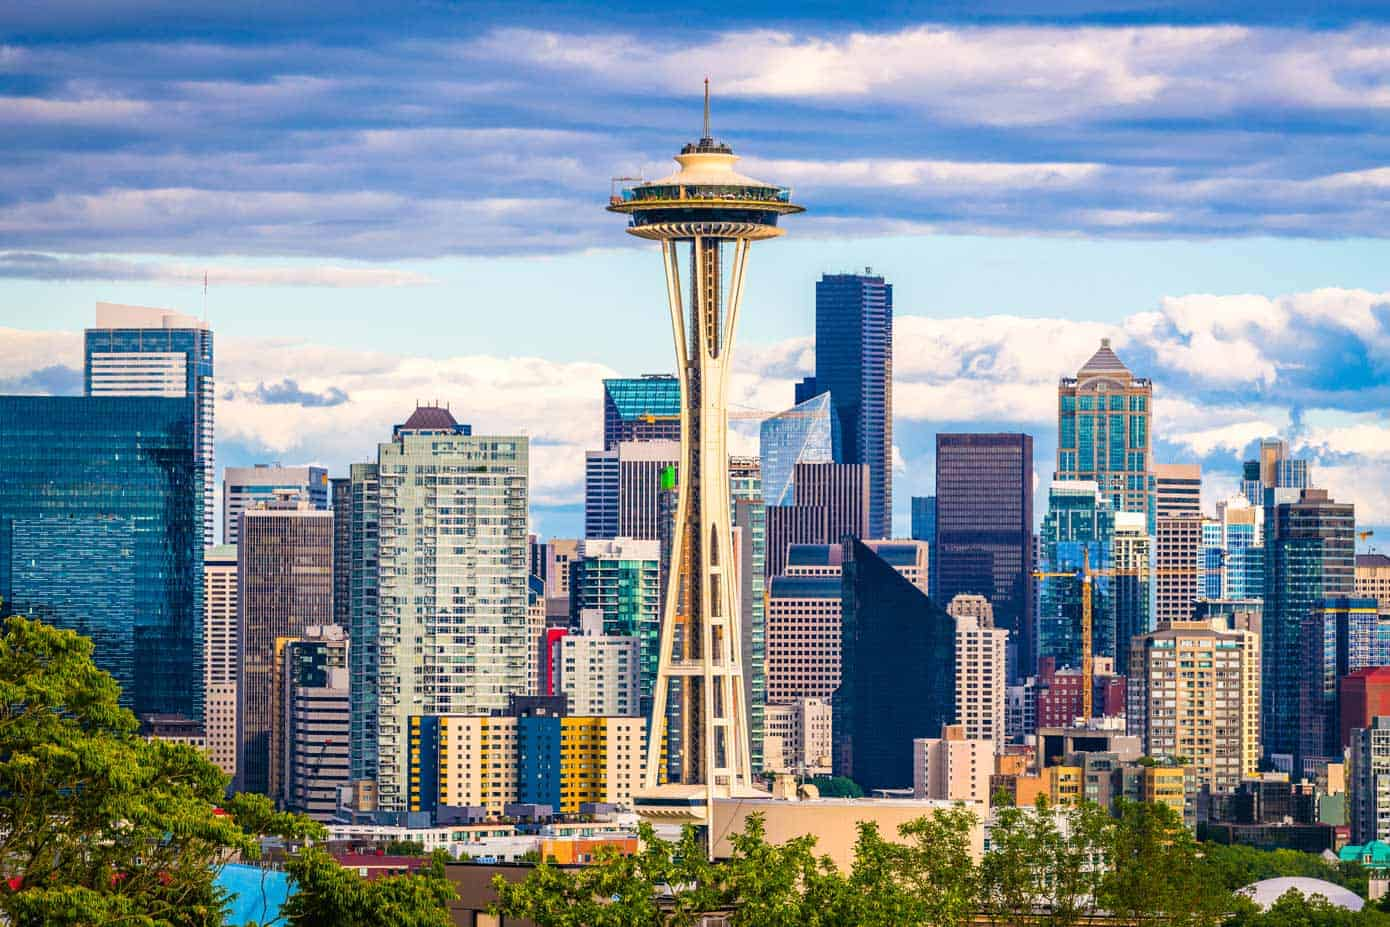 Seattle Space Needle and skyline in Washington, USA.